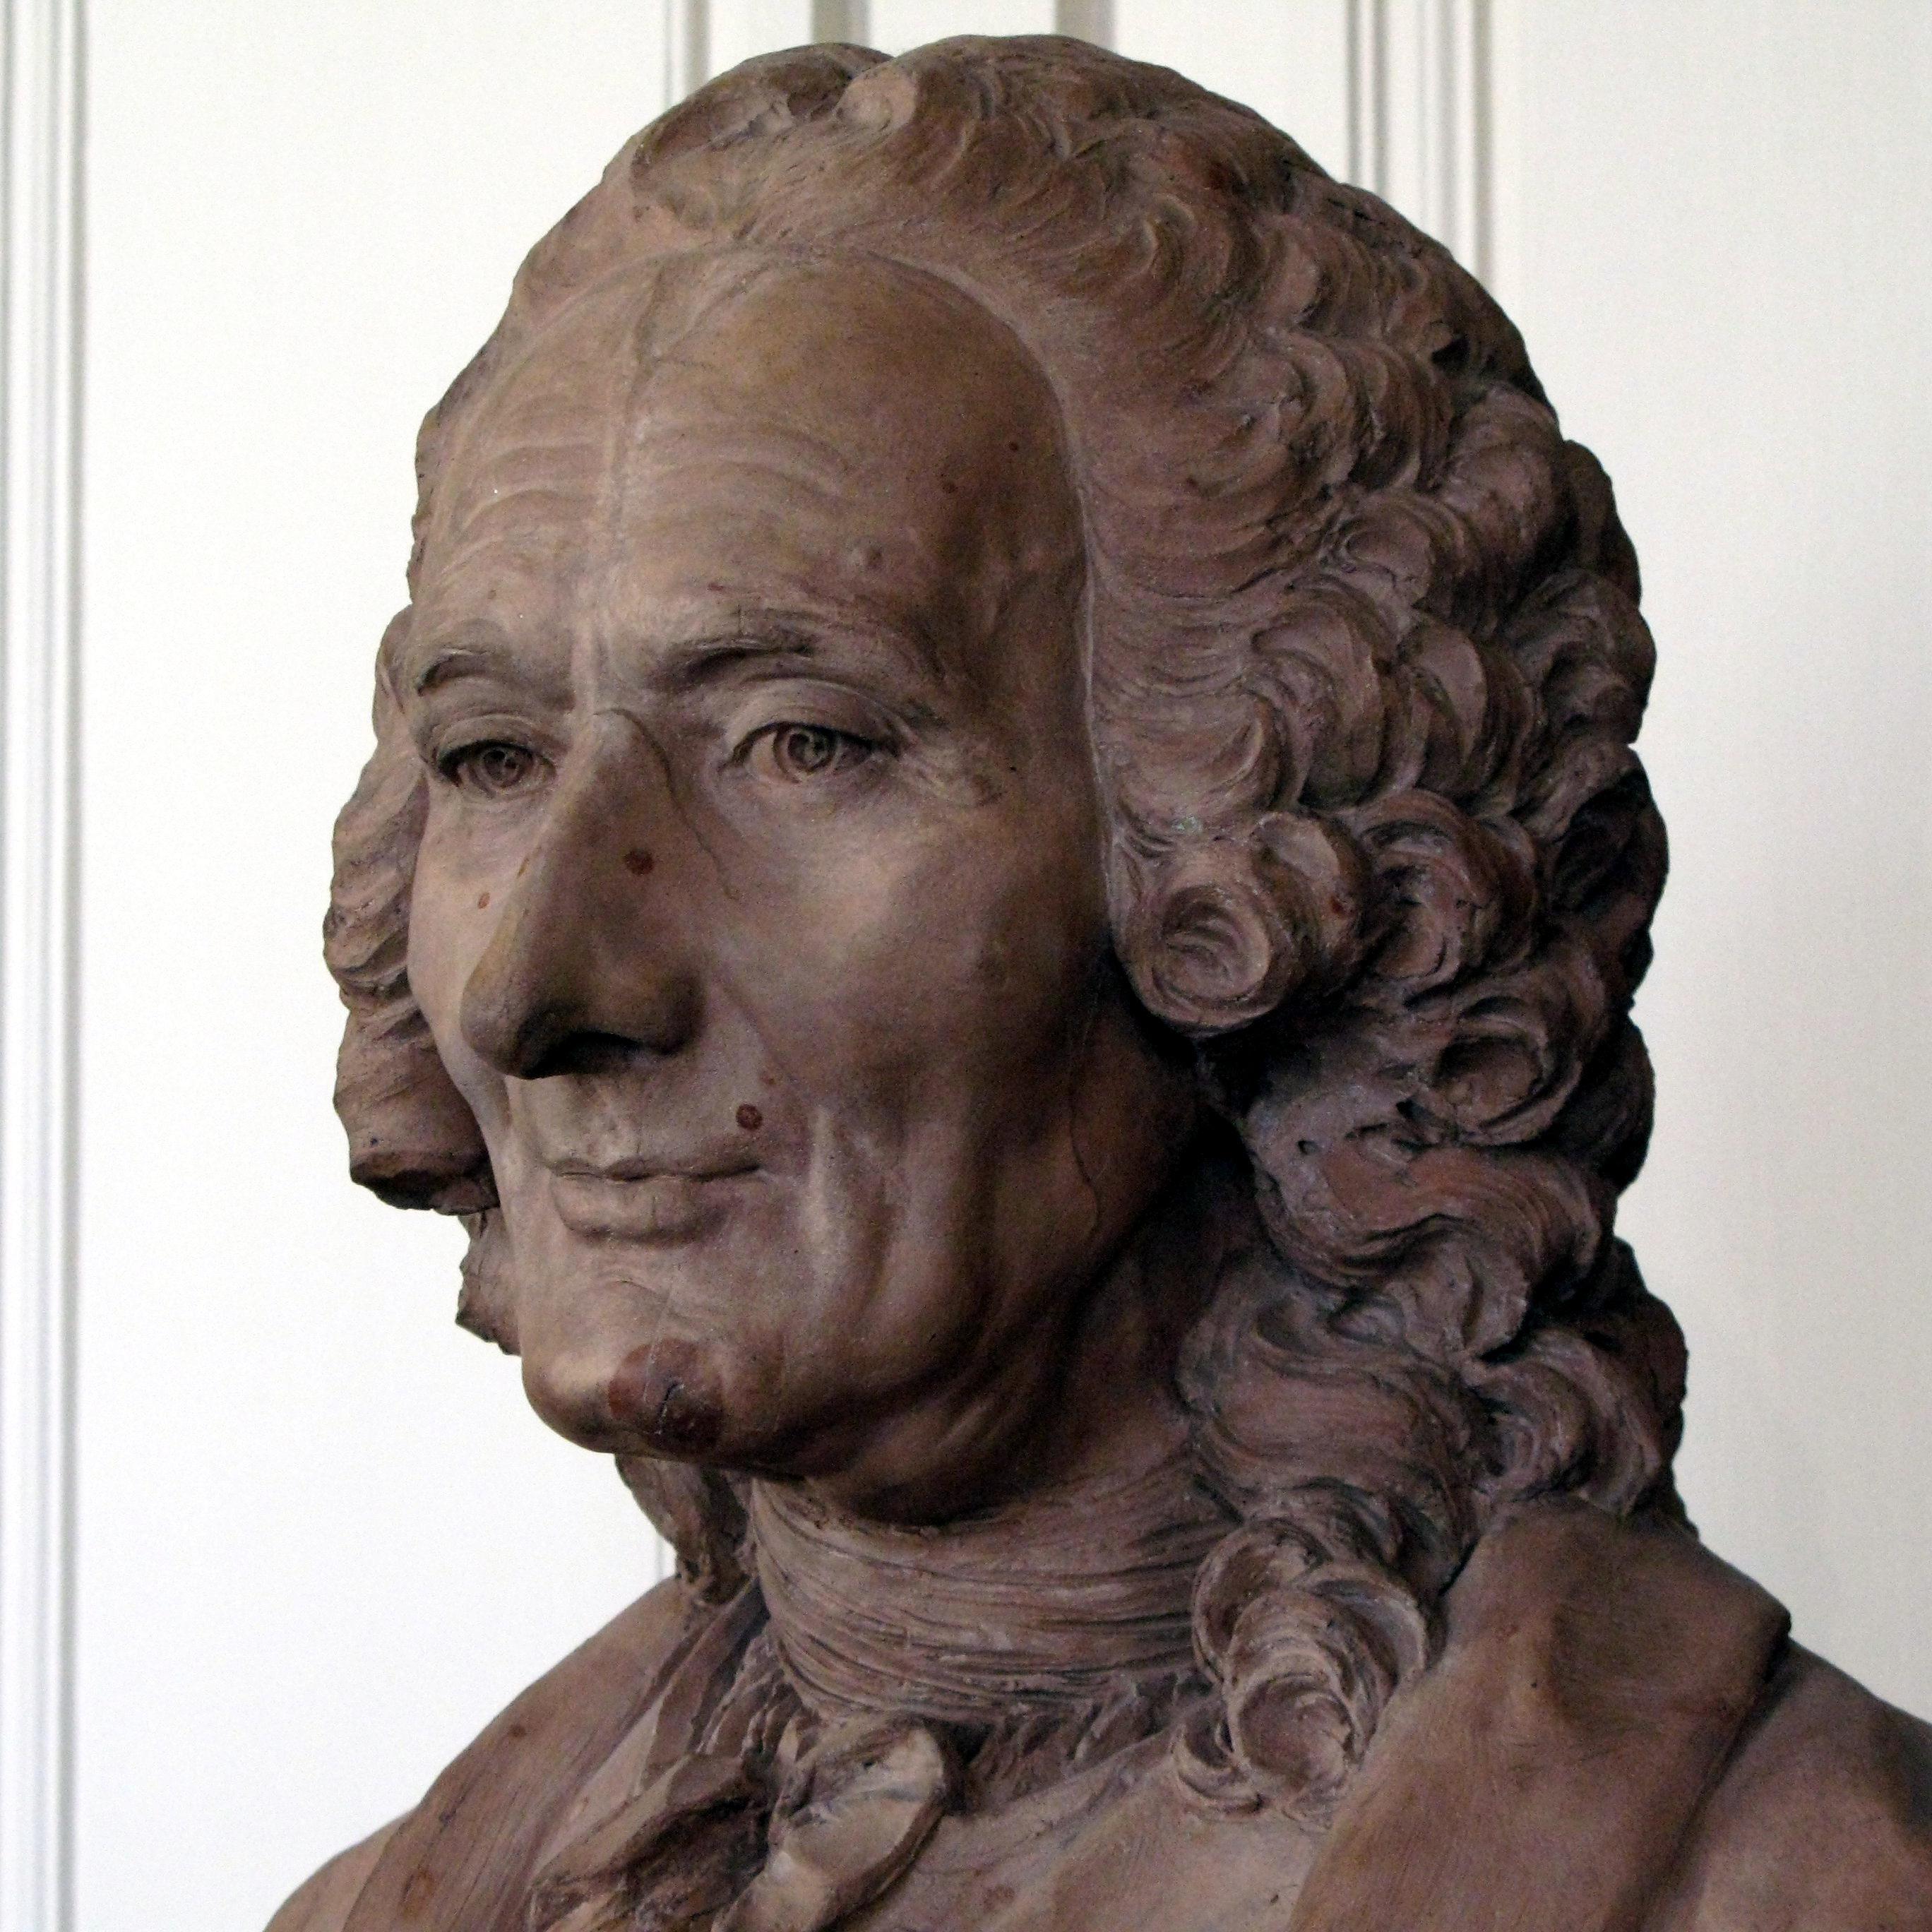 Jean-Philippe Rameau Credit: http://upload.wikimedia.org/